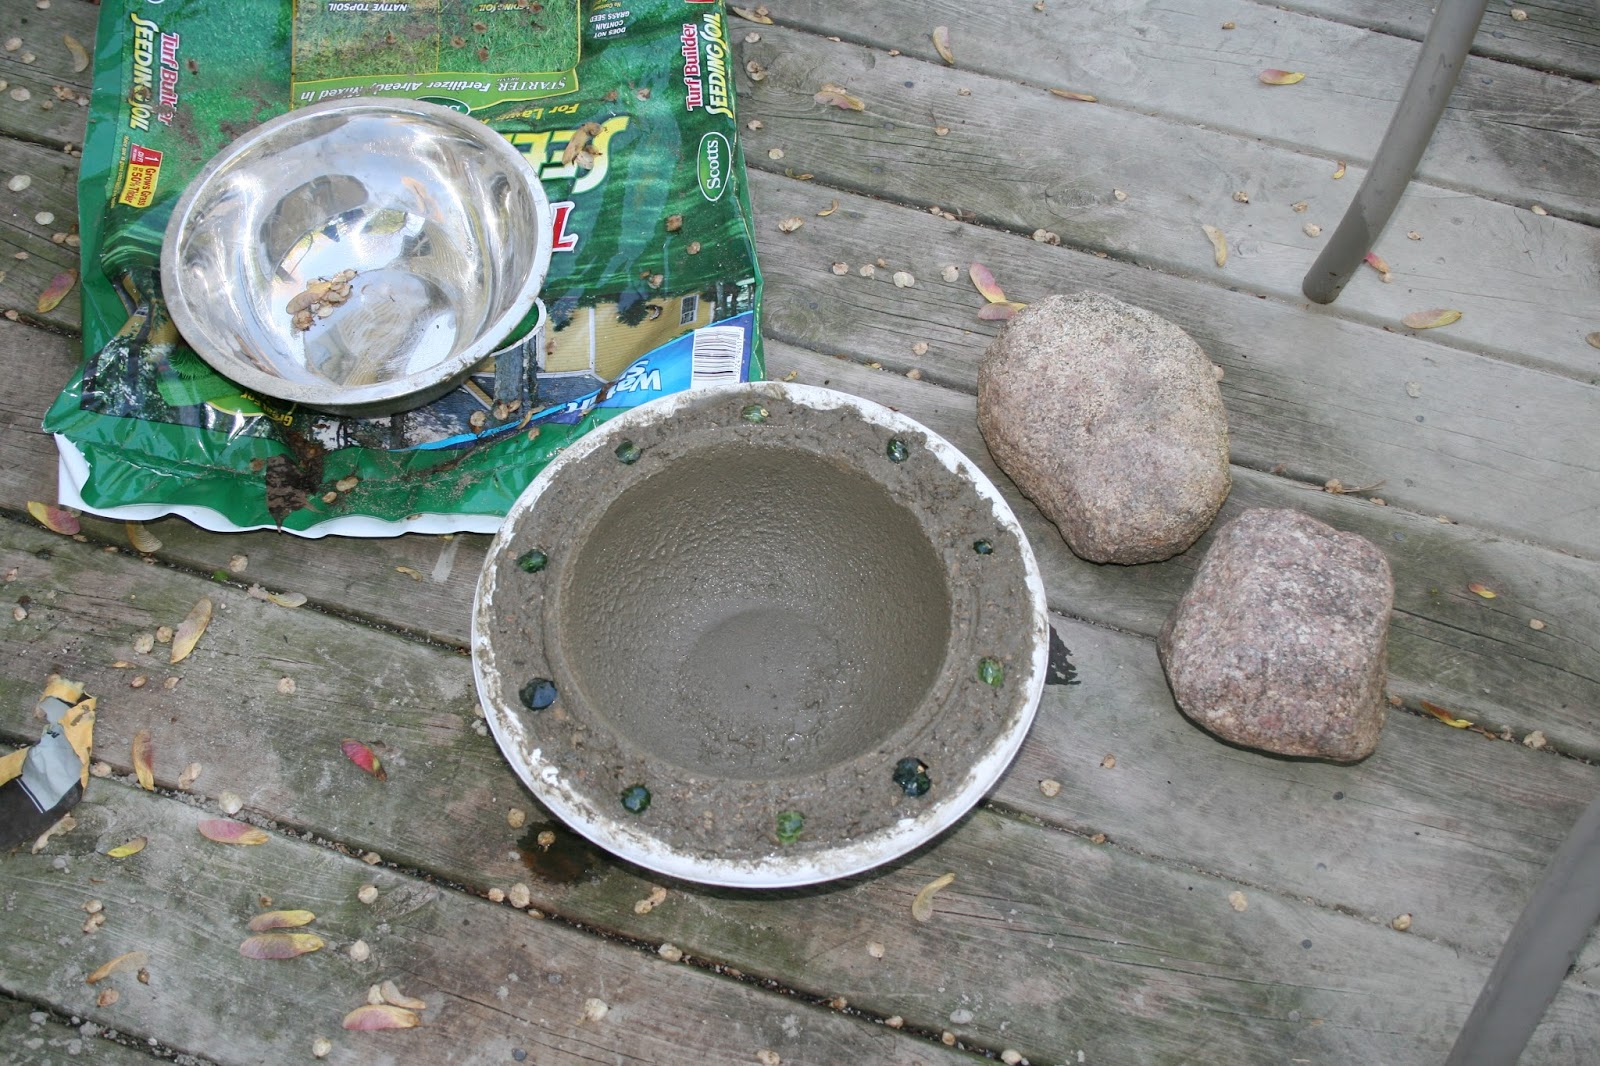 Ashley Diy Diy Concrete Bird Bath For Under Ten Bucks